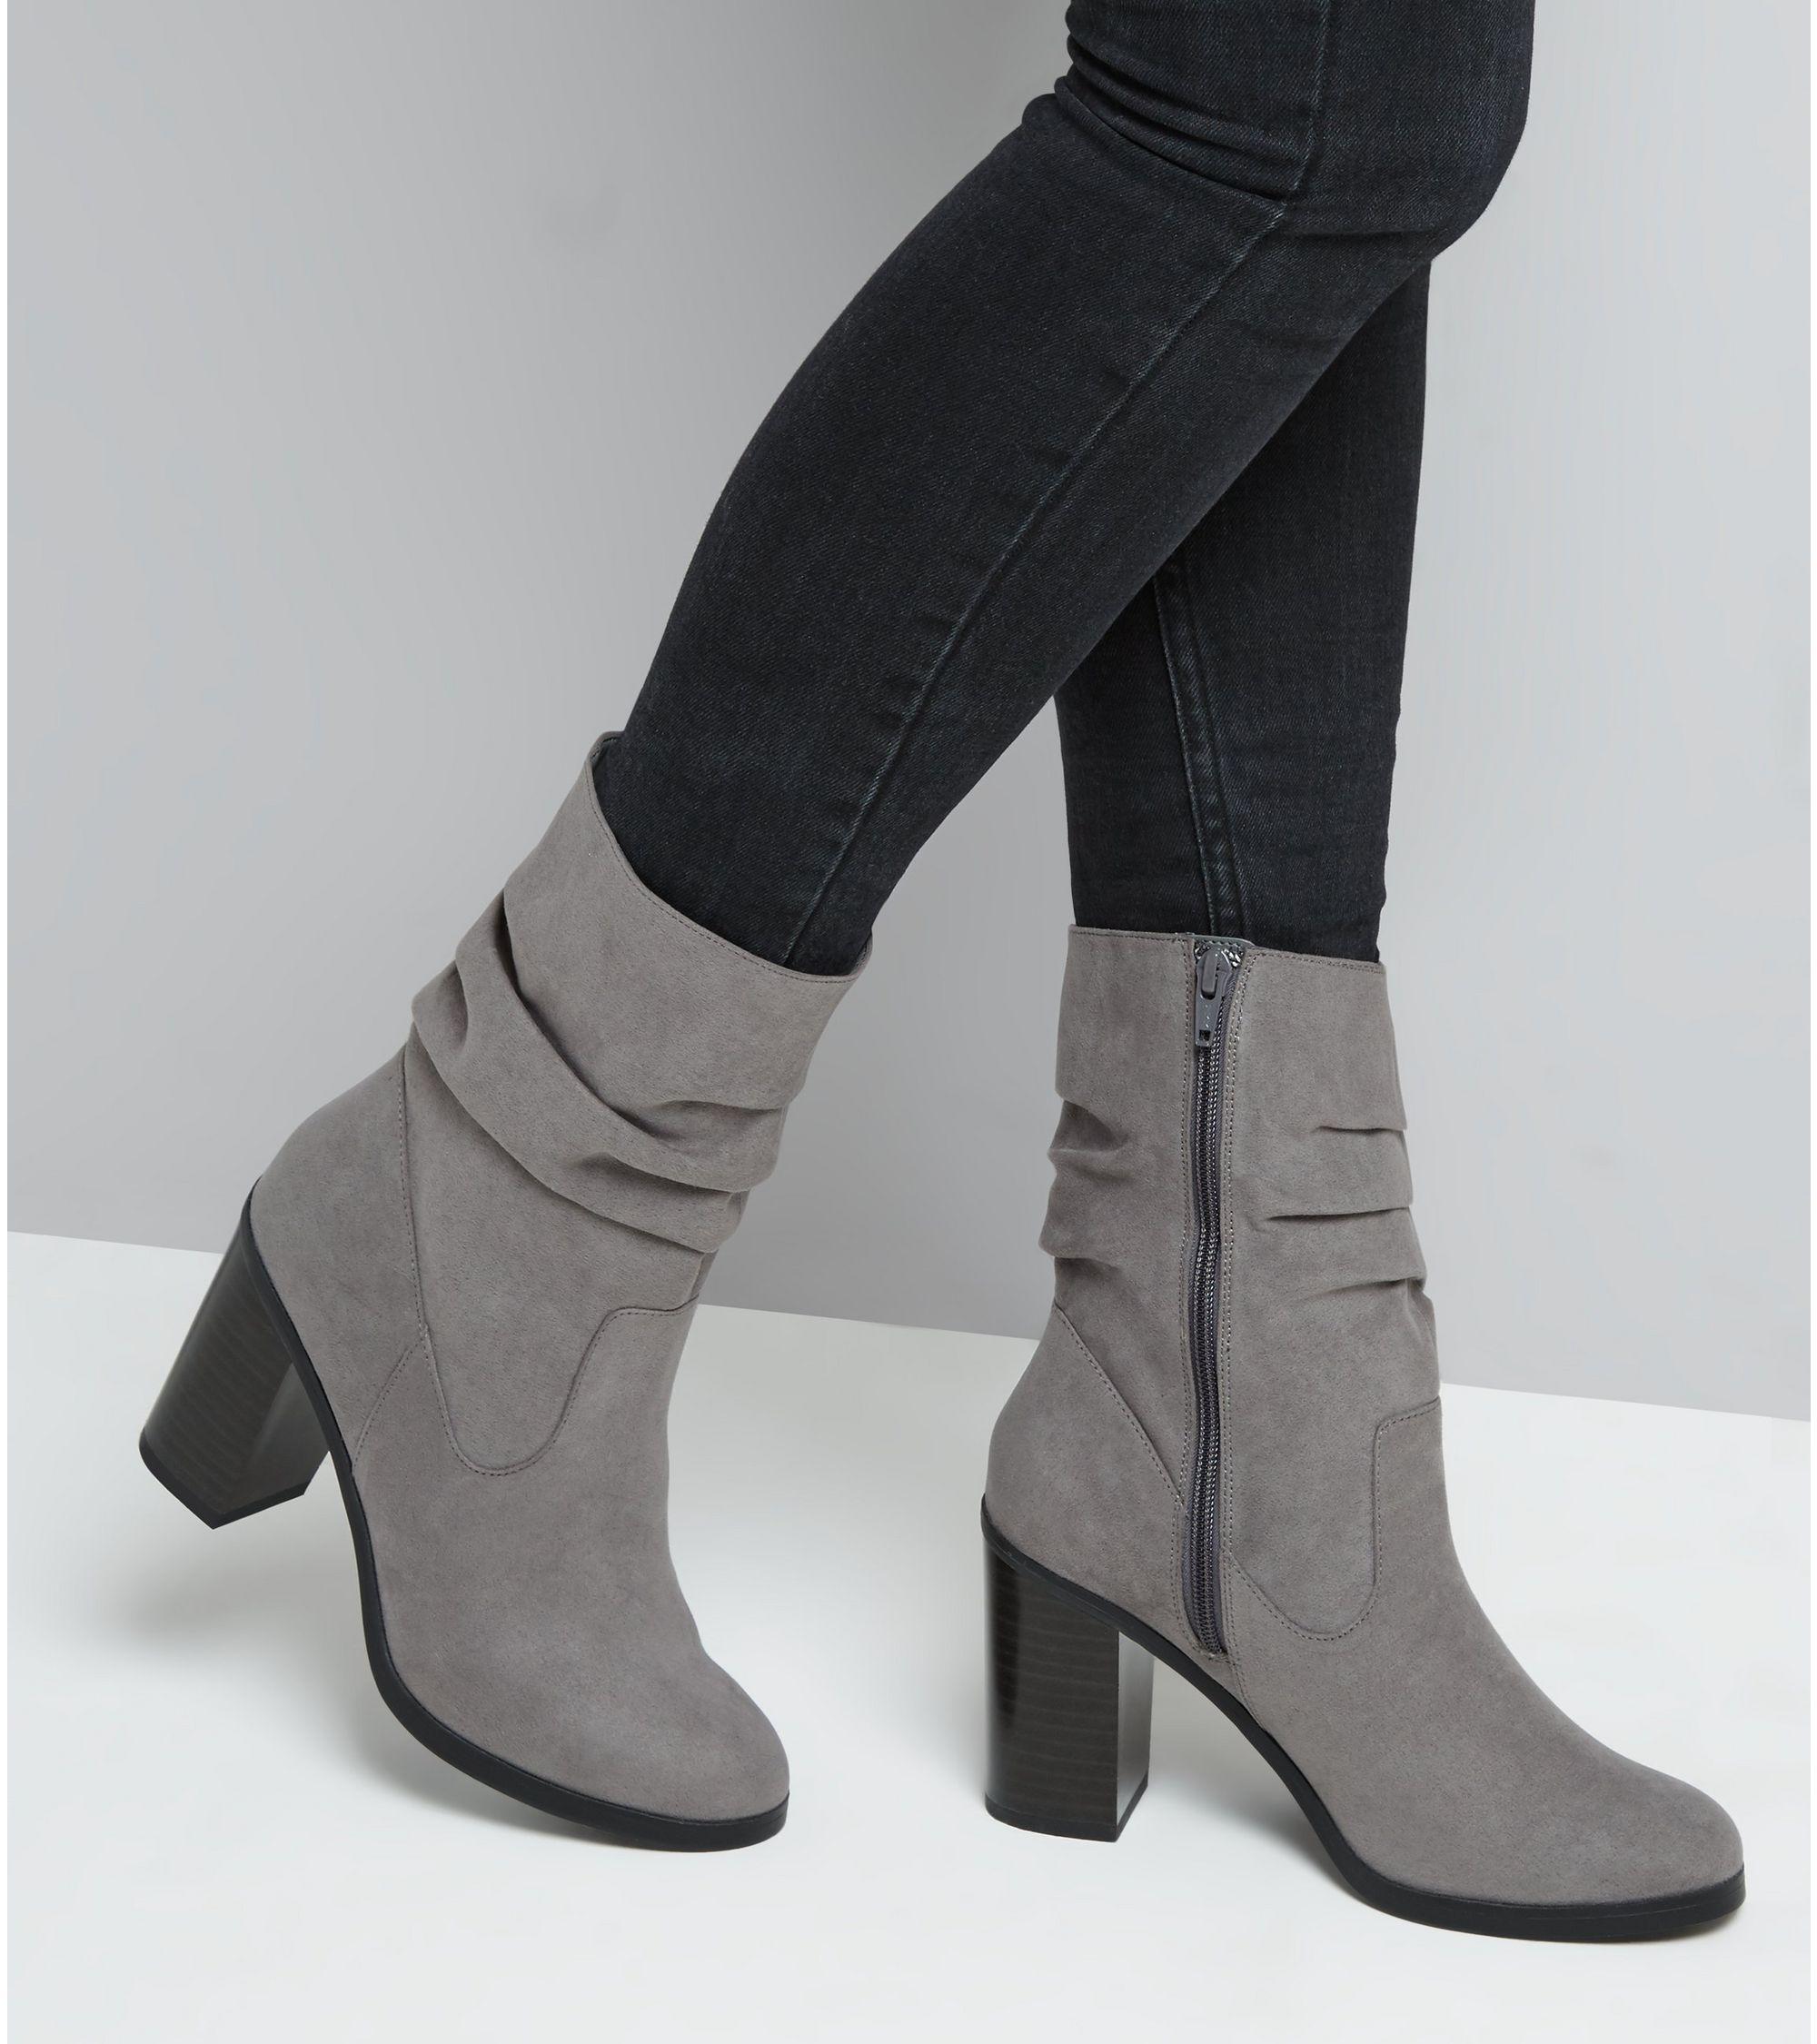 bdd4e46c53d Grey Suedette Slouchy Block Heel Mid Calf Boots